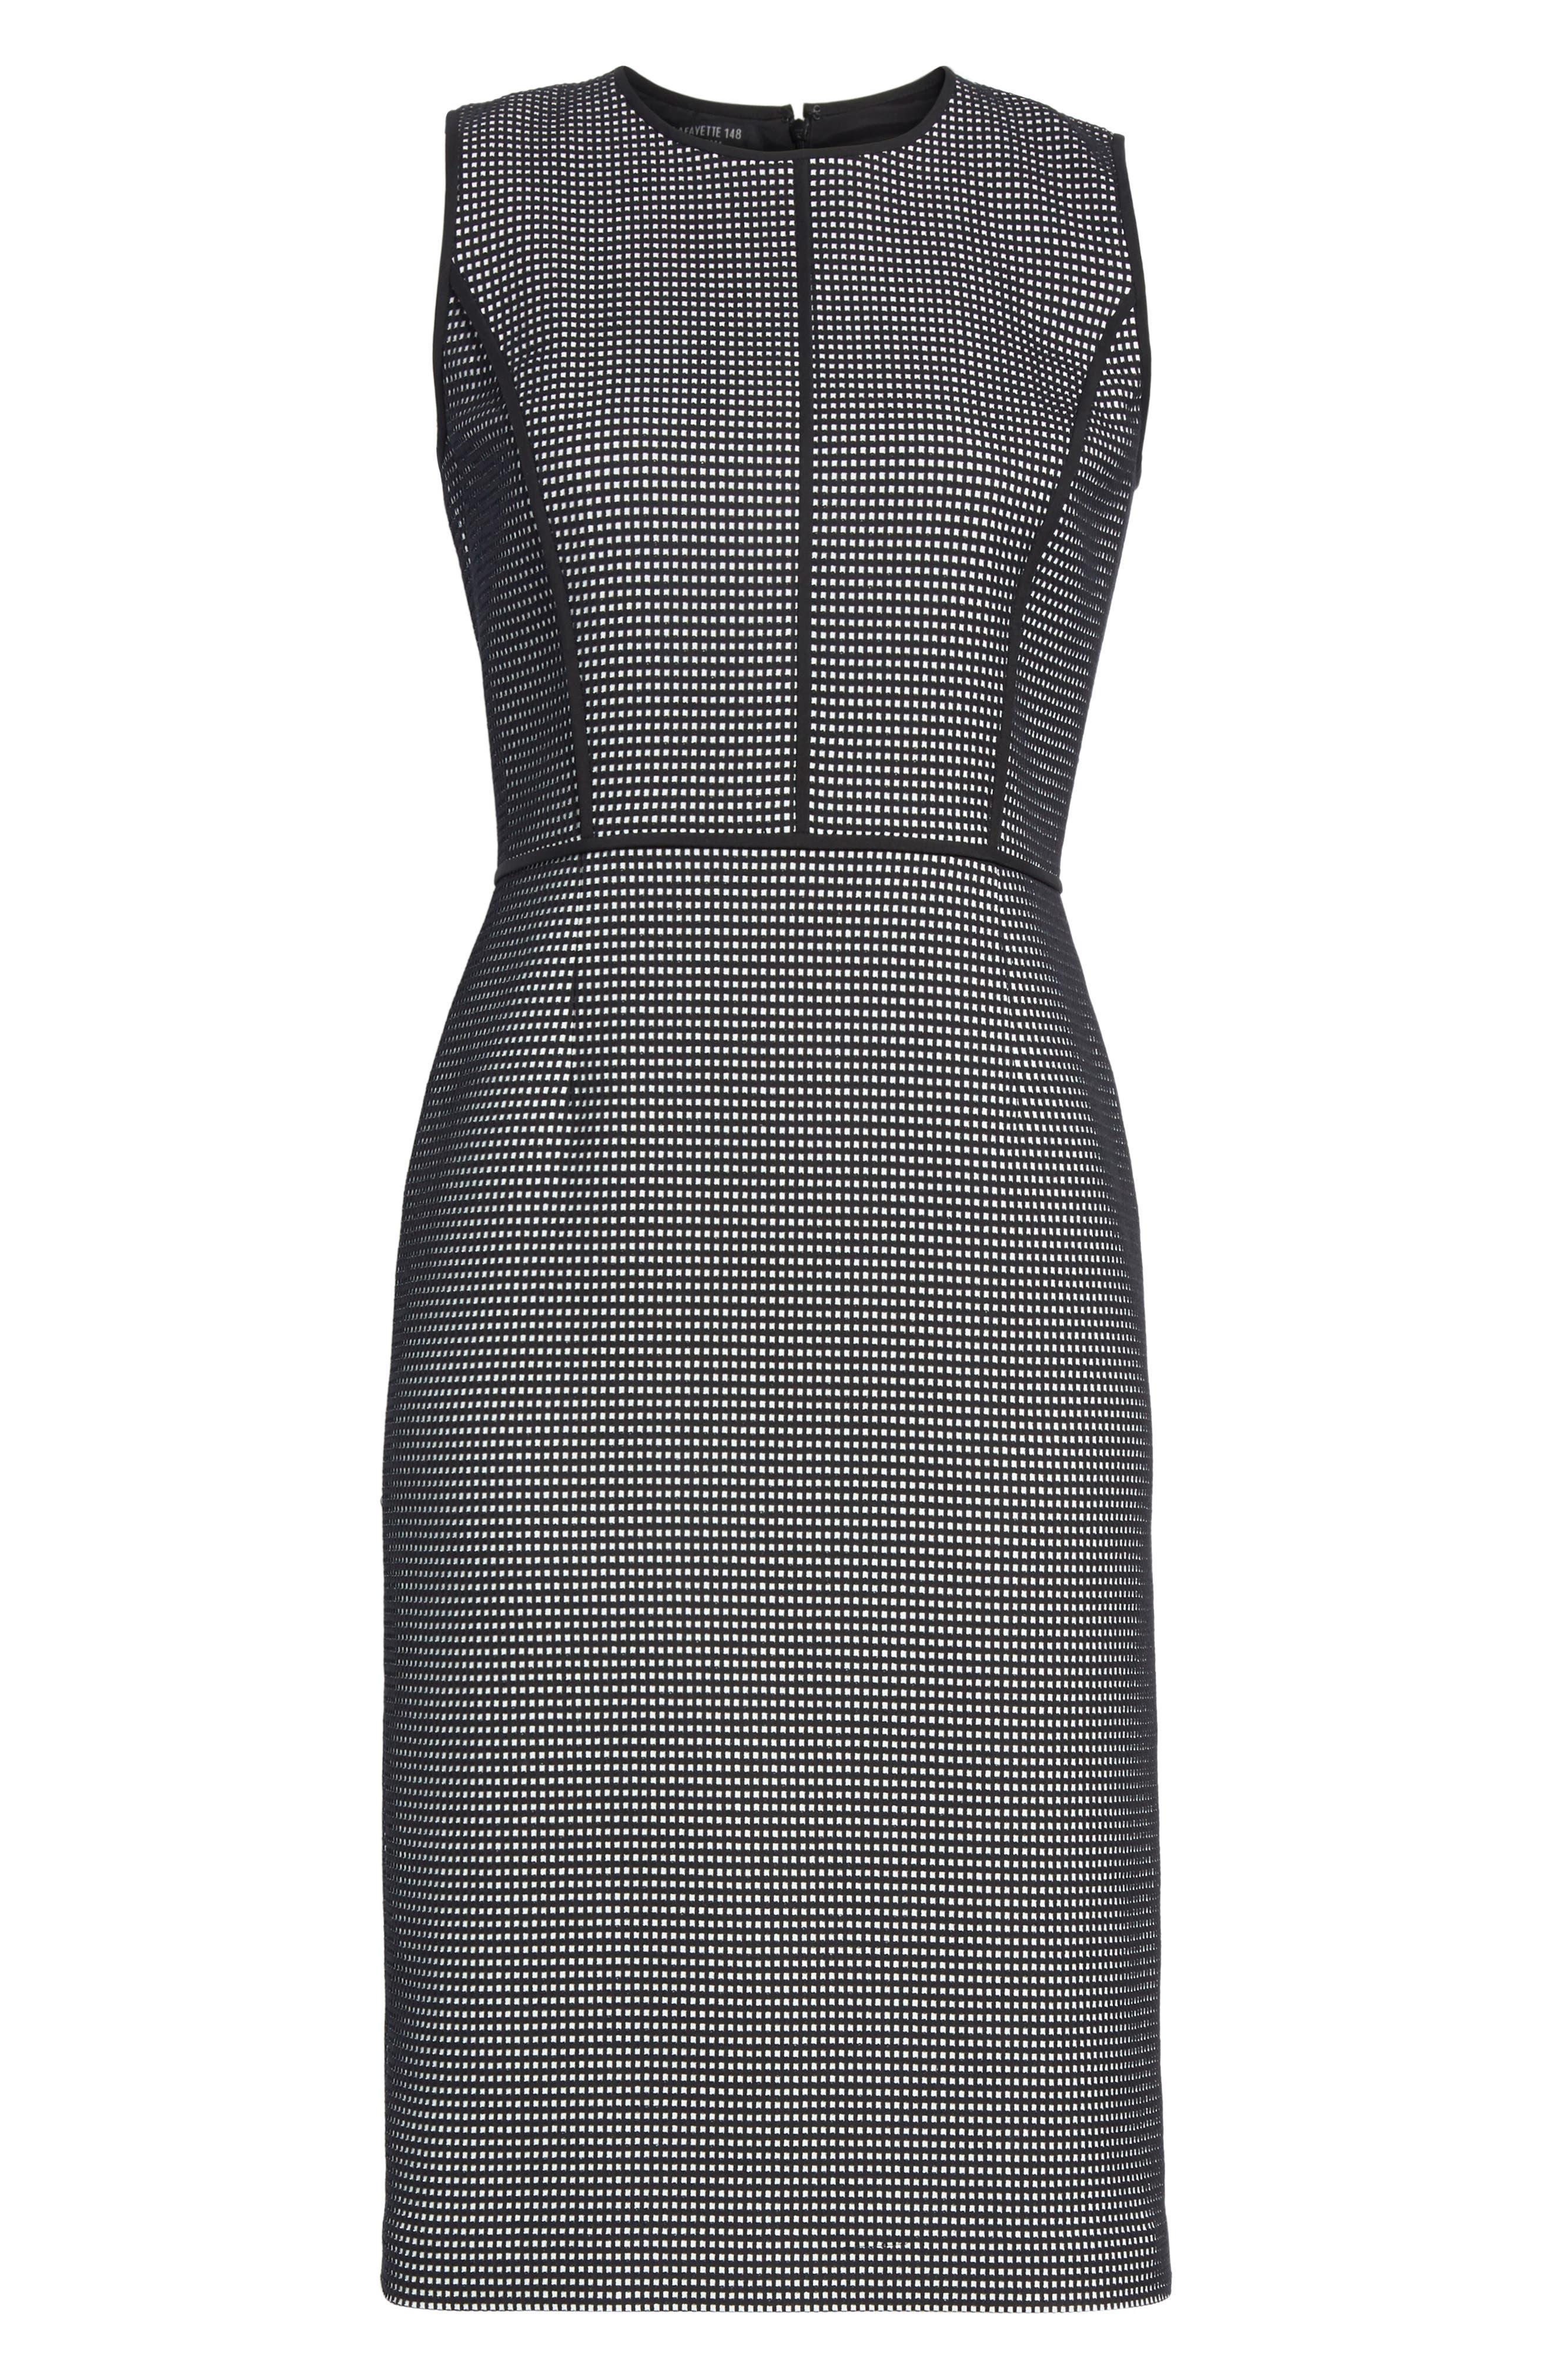 Bree Check Sheath Dress,                             Alternate thumbnail 6, color,